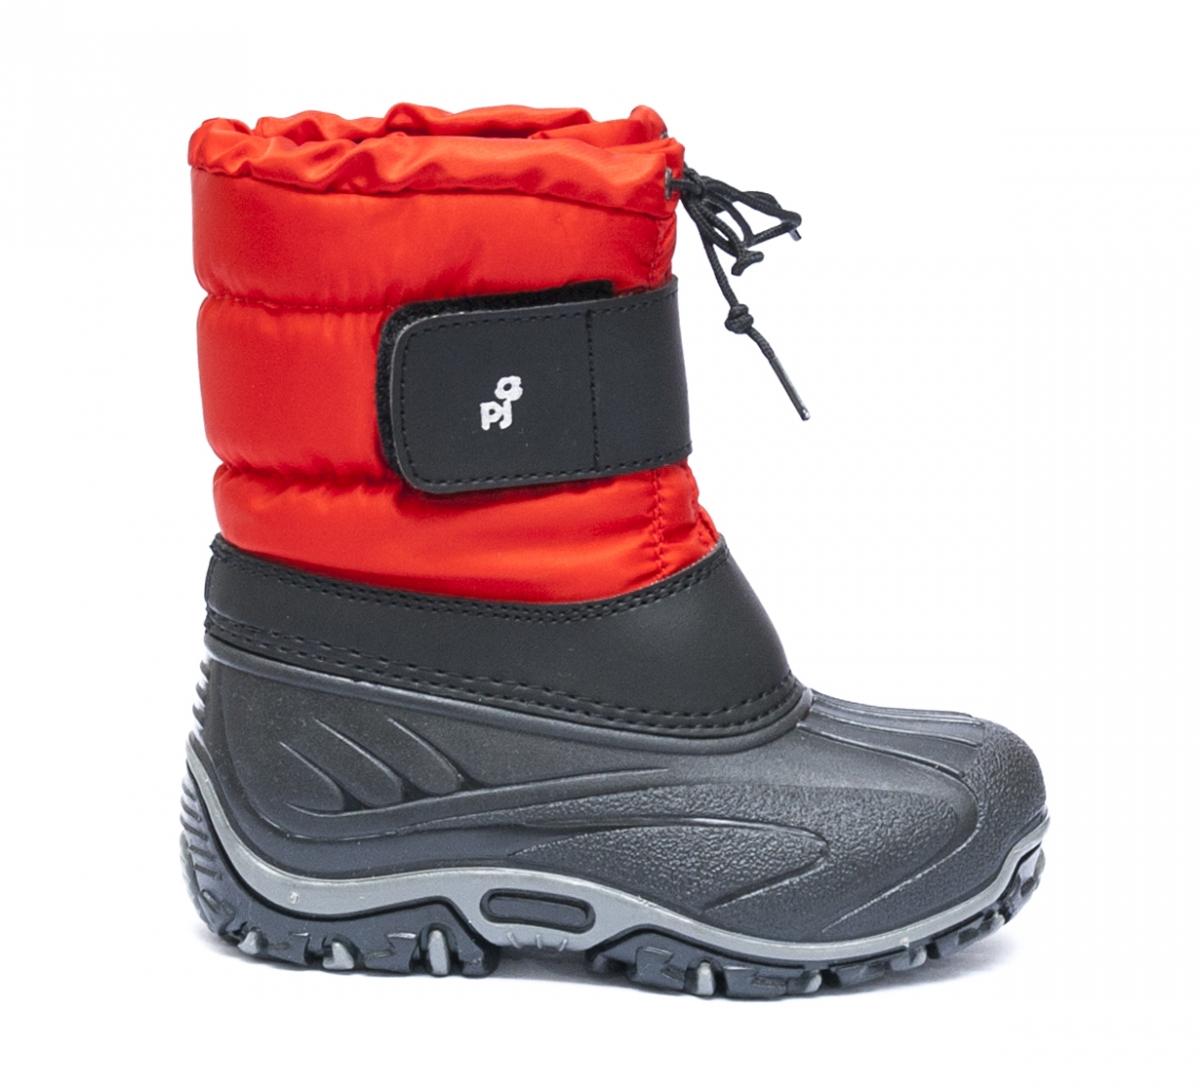 Apreschiuri copii de iarna pj shoes Fun royal 21-36